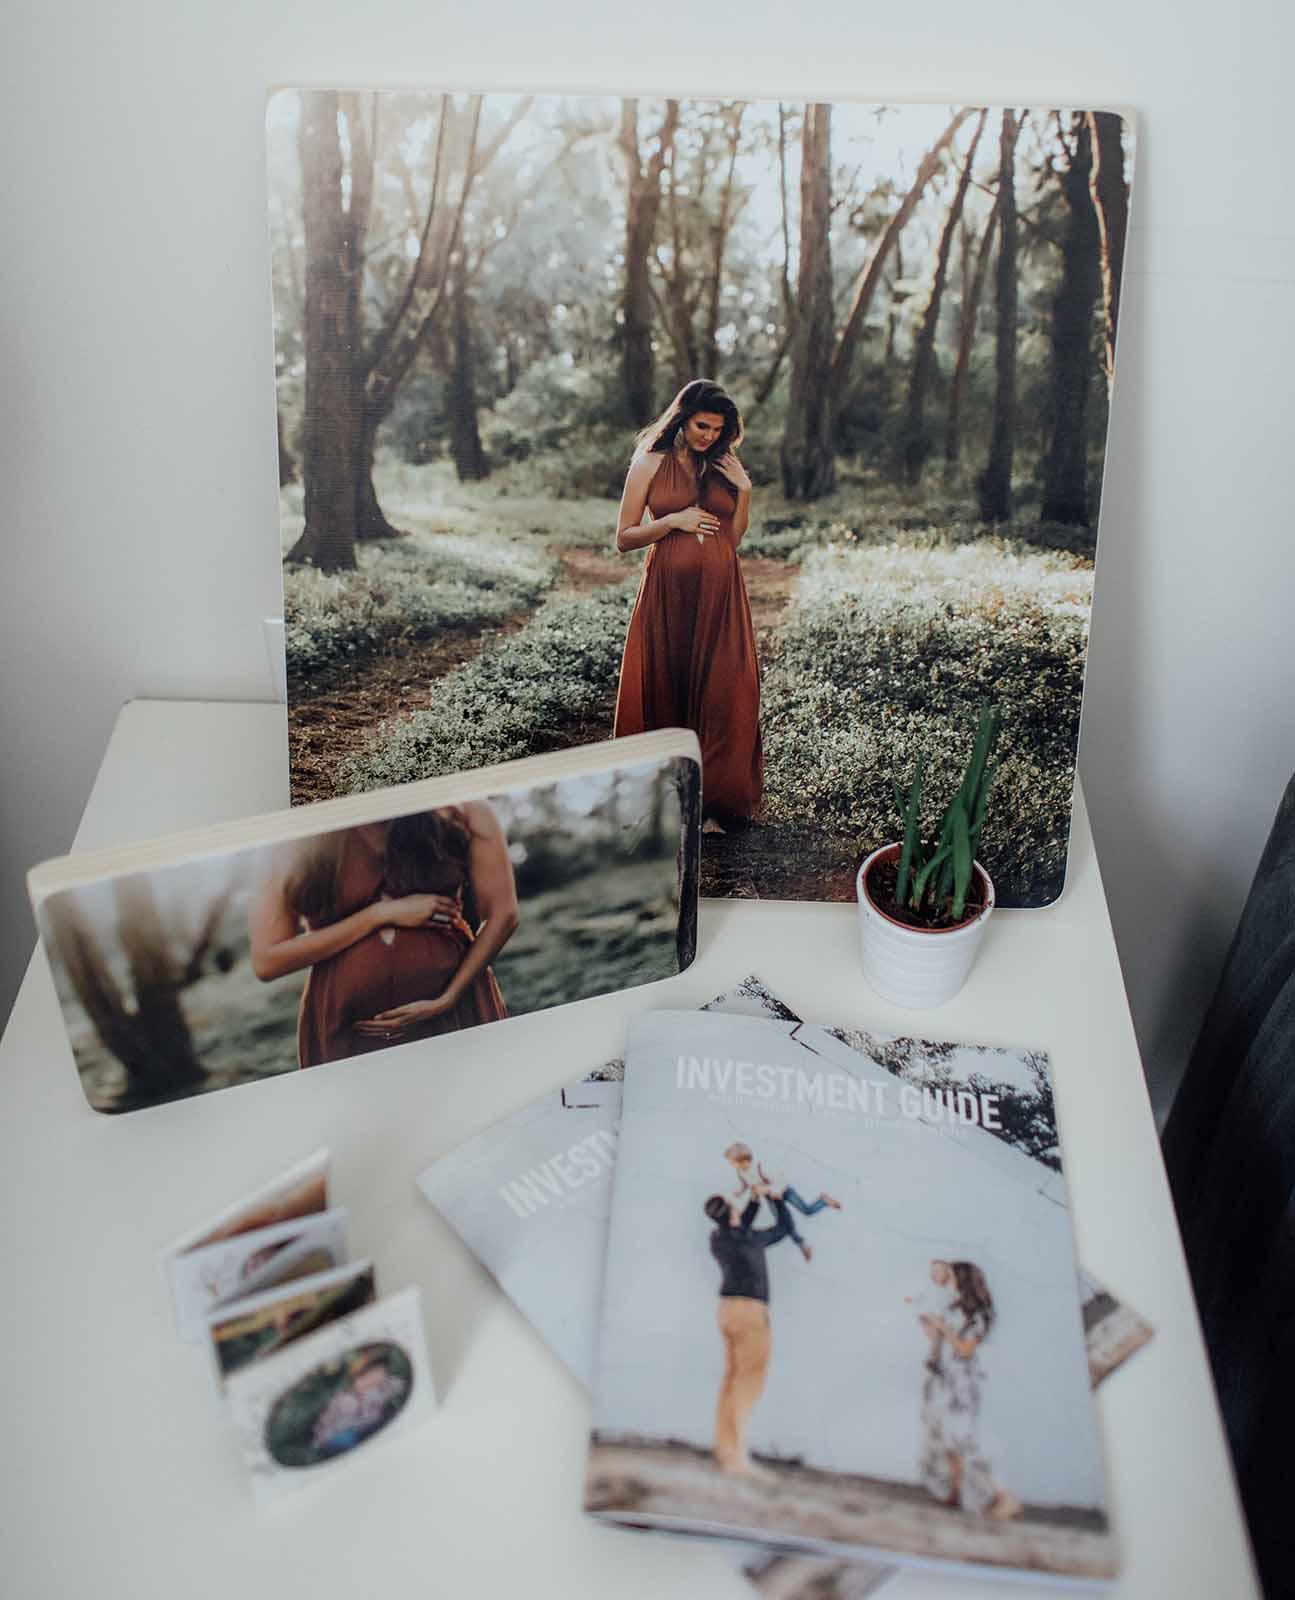 Newborn photography studio essentials - samples